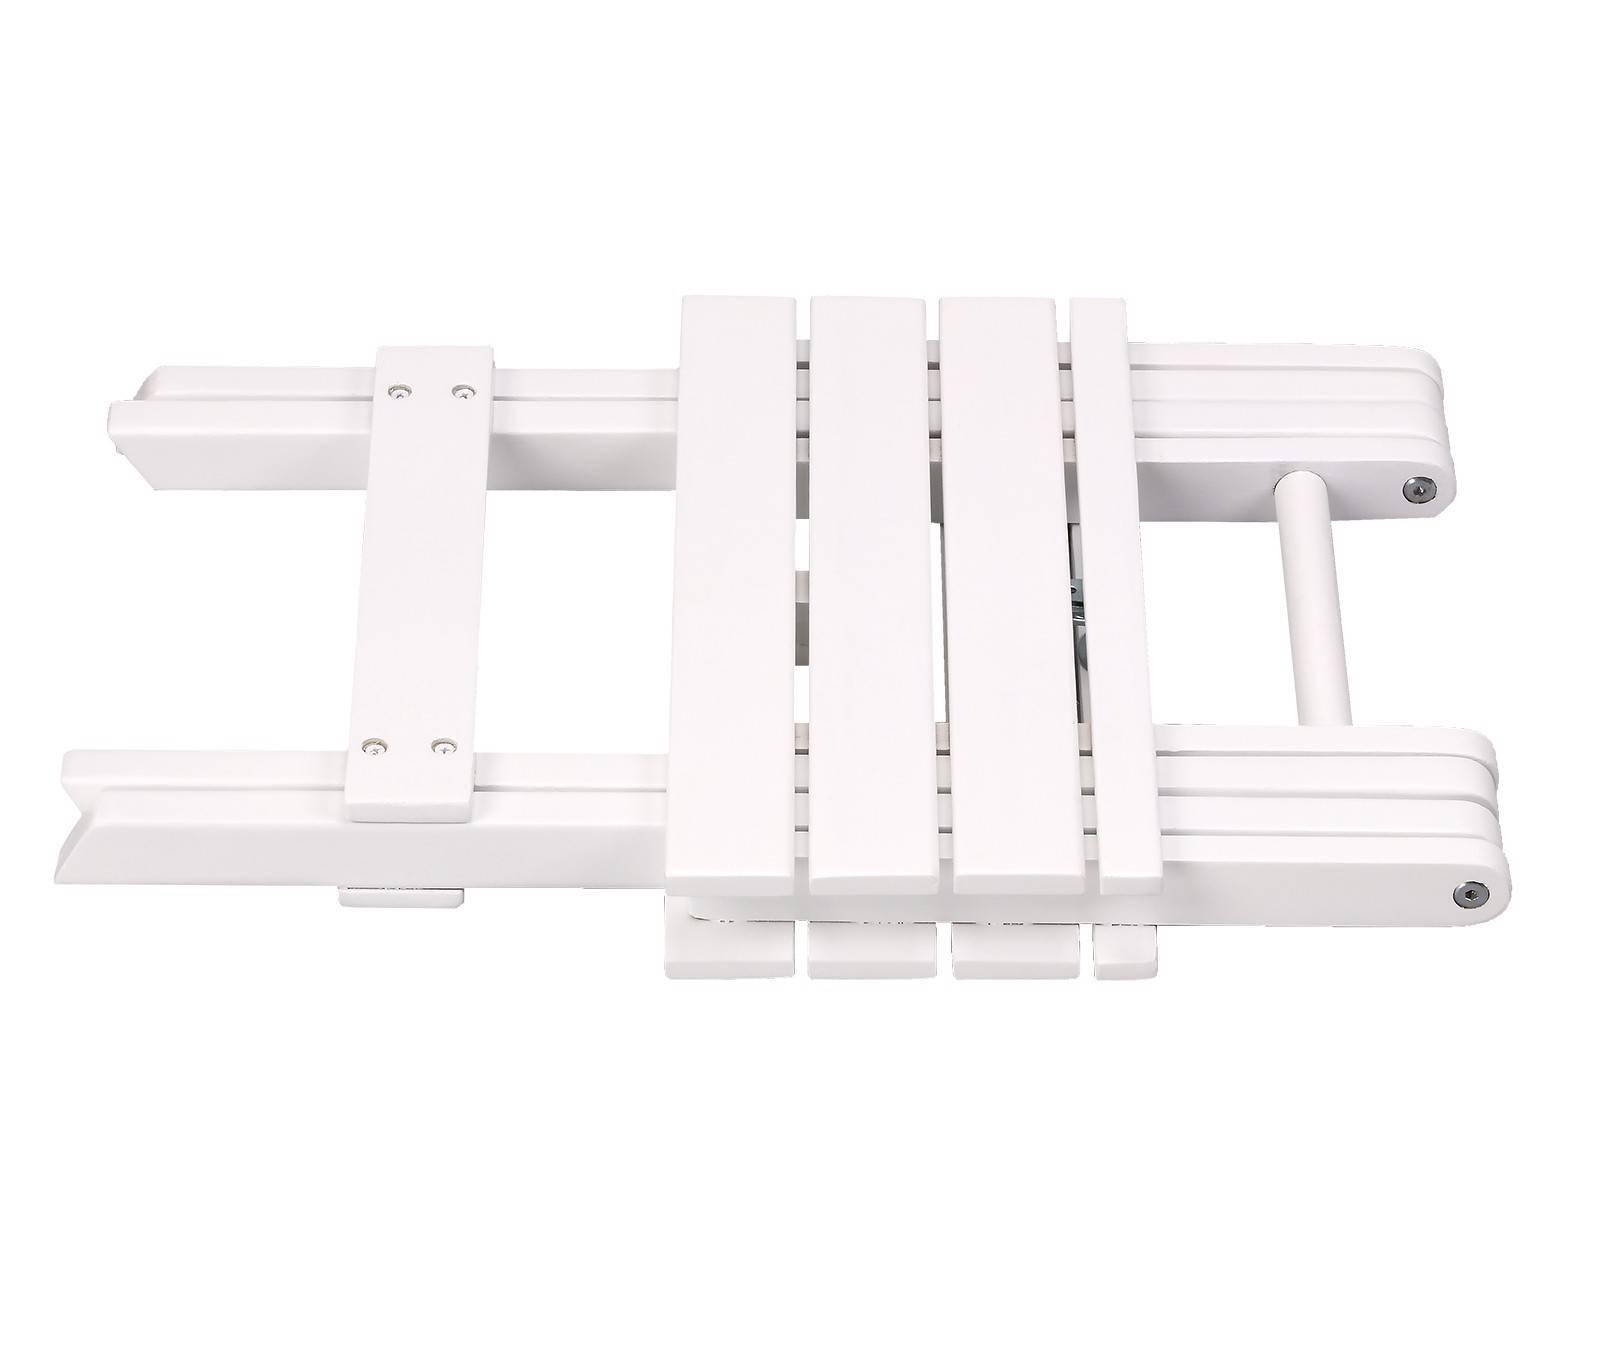 Square table, Acacia Hardwood Folding, White colour